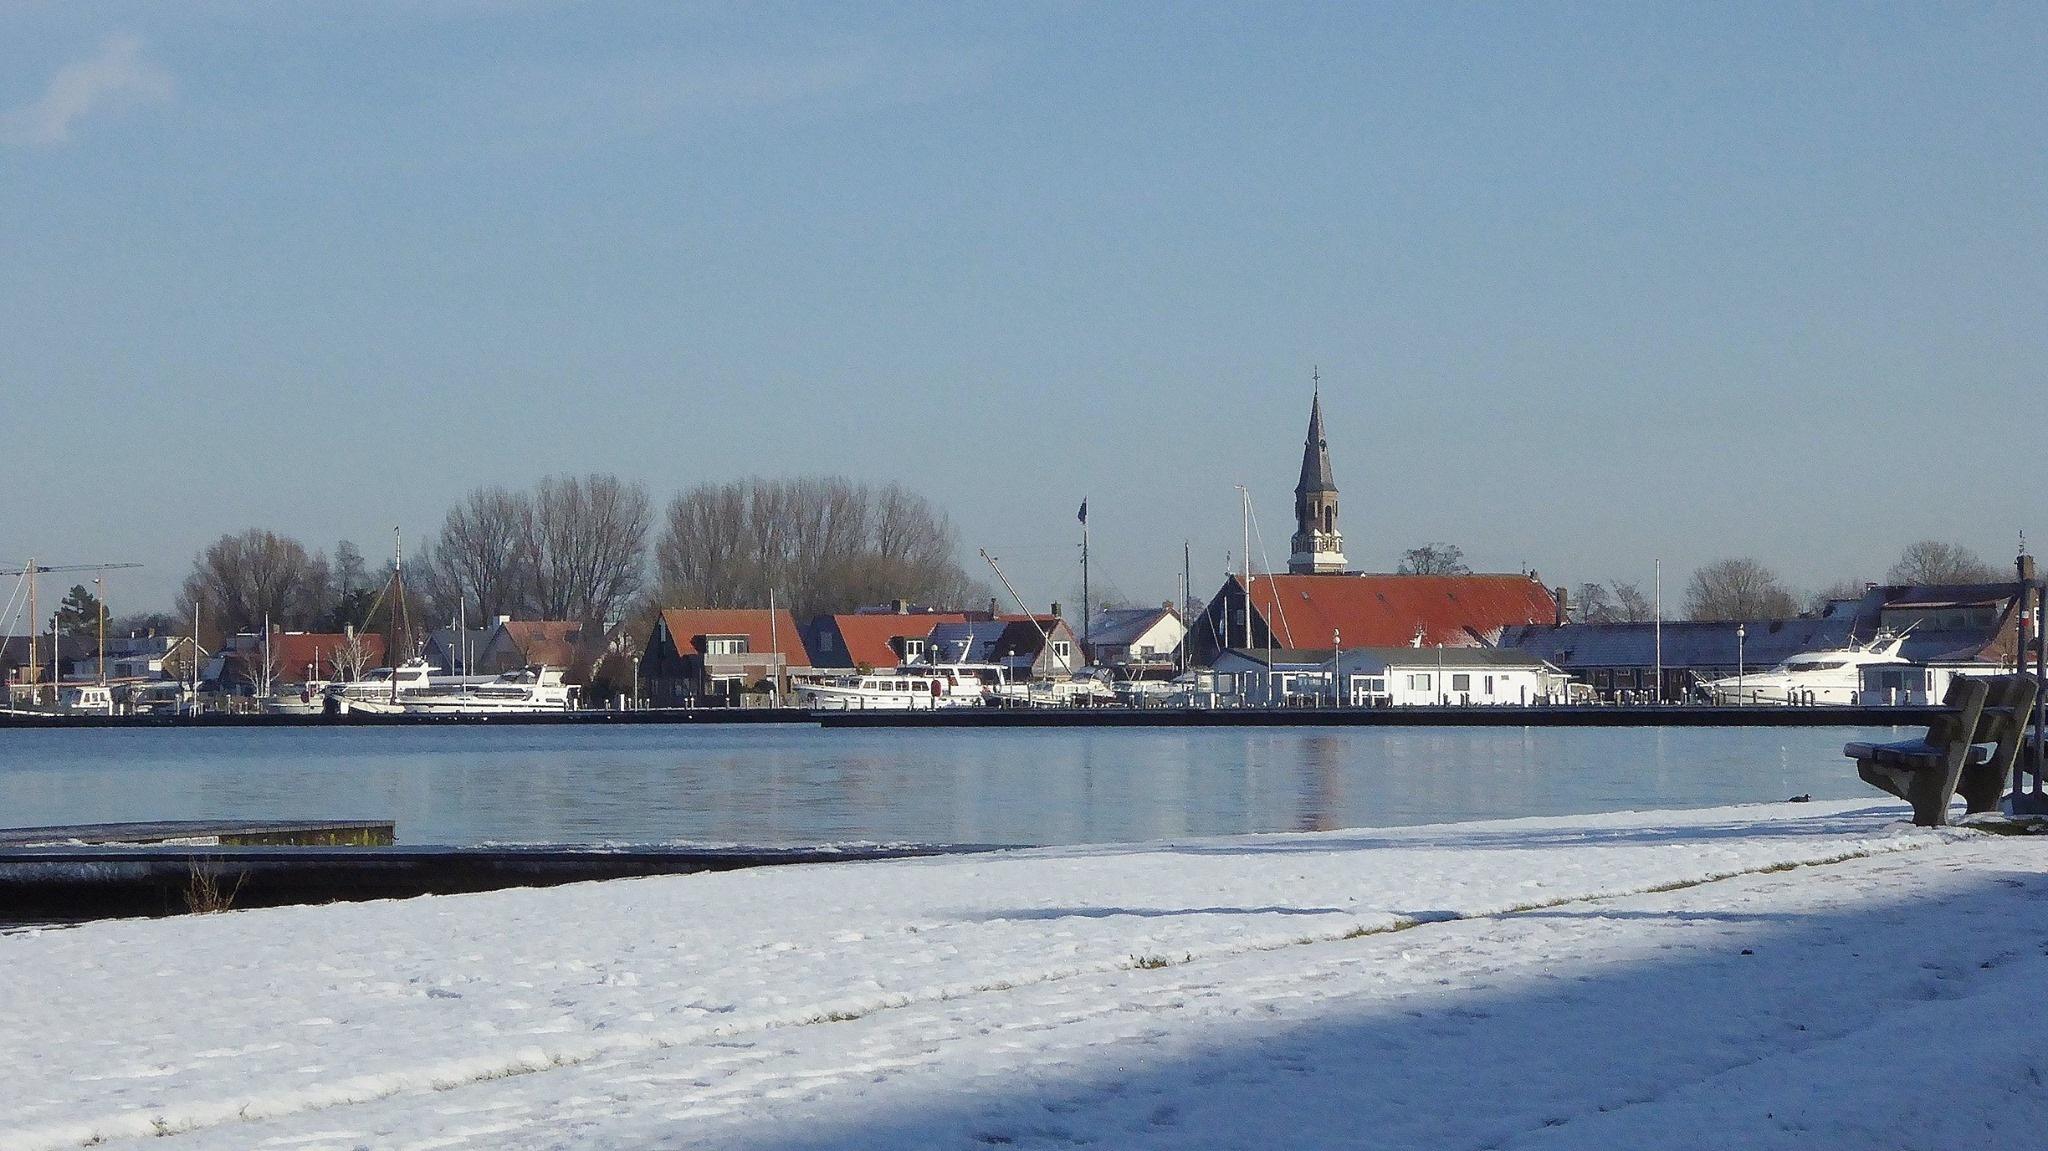 My village Kudelstaart. by inimini